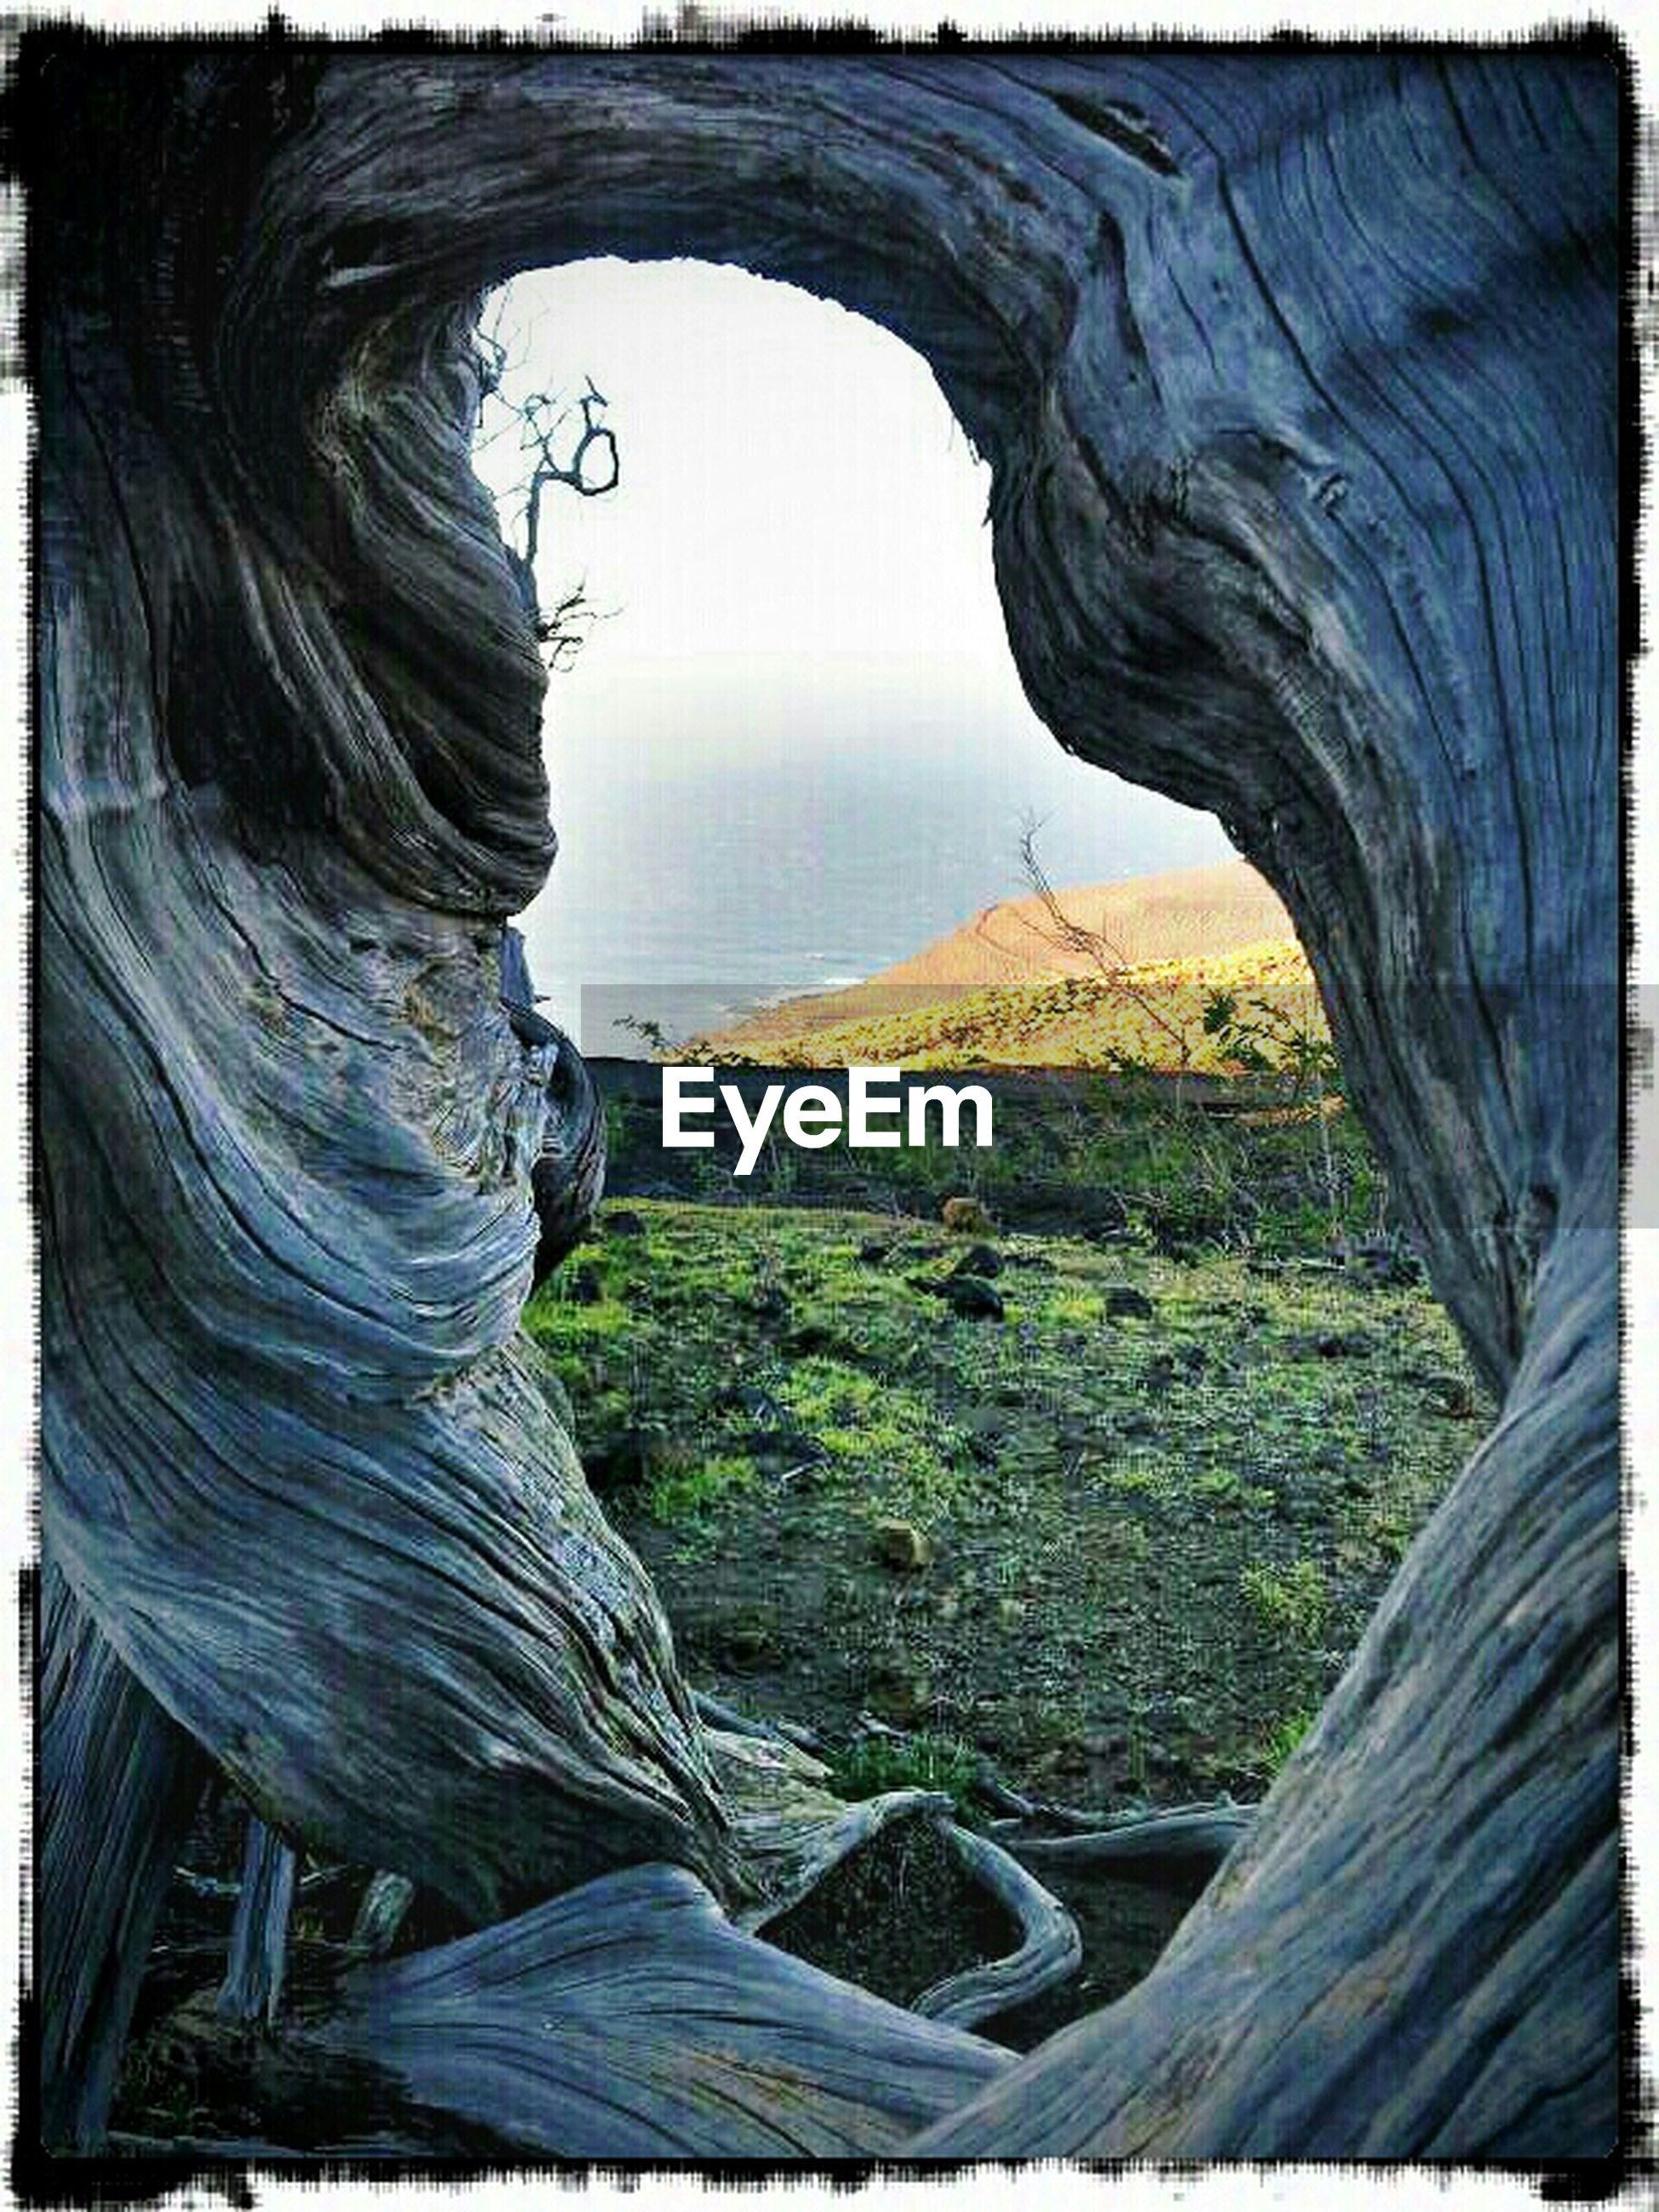 Landscape seen through sabina tree